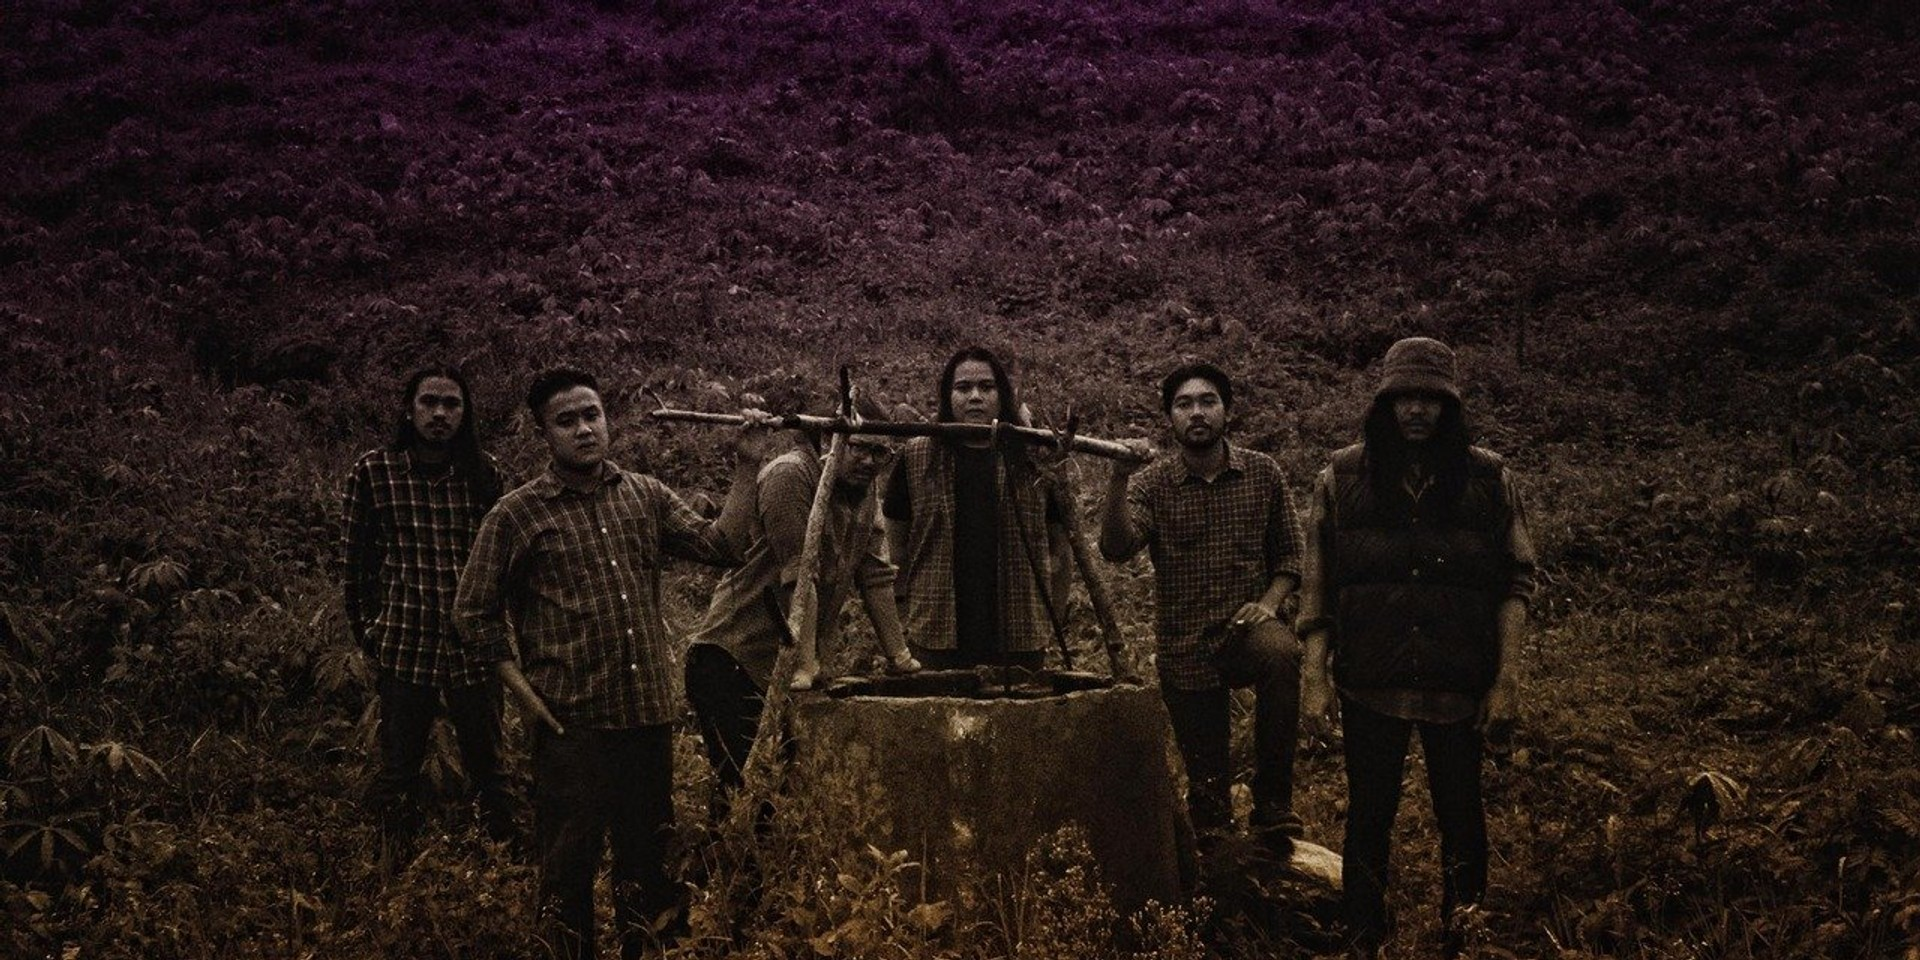 Bandung-based folk band Rusa Militan release new album 'No Future'